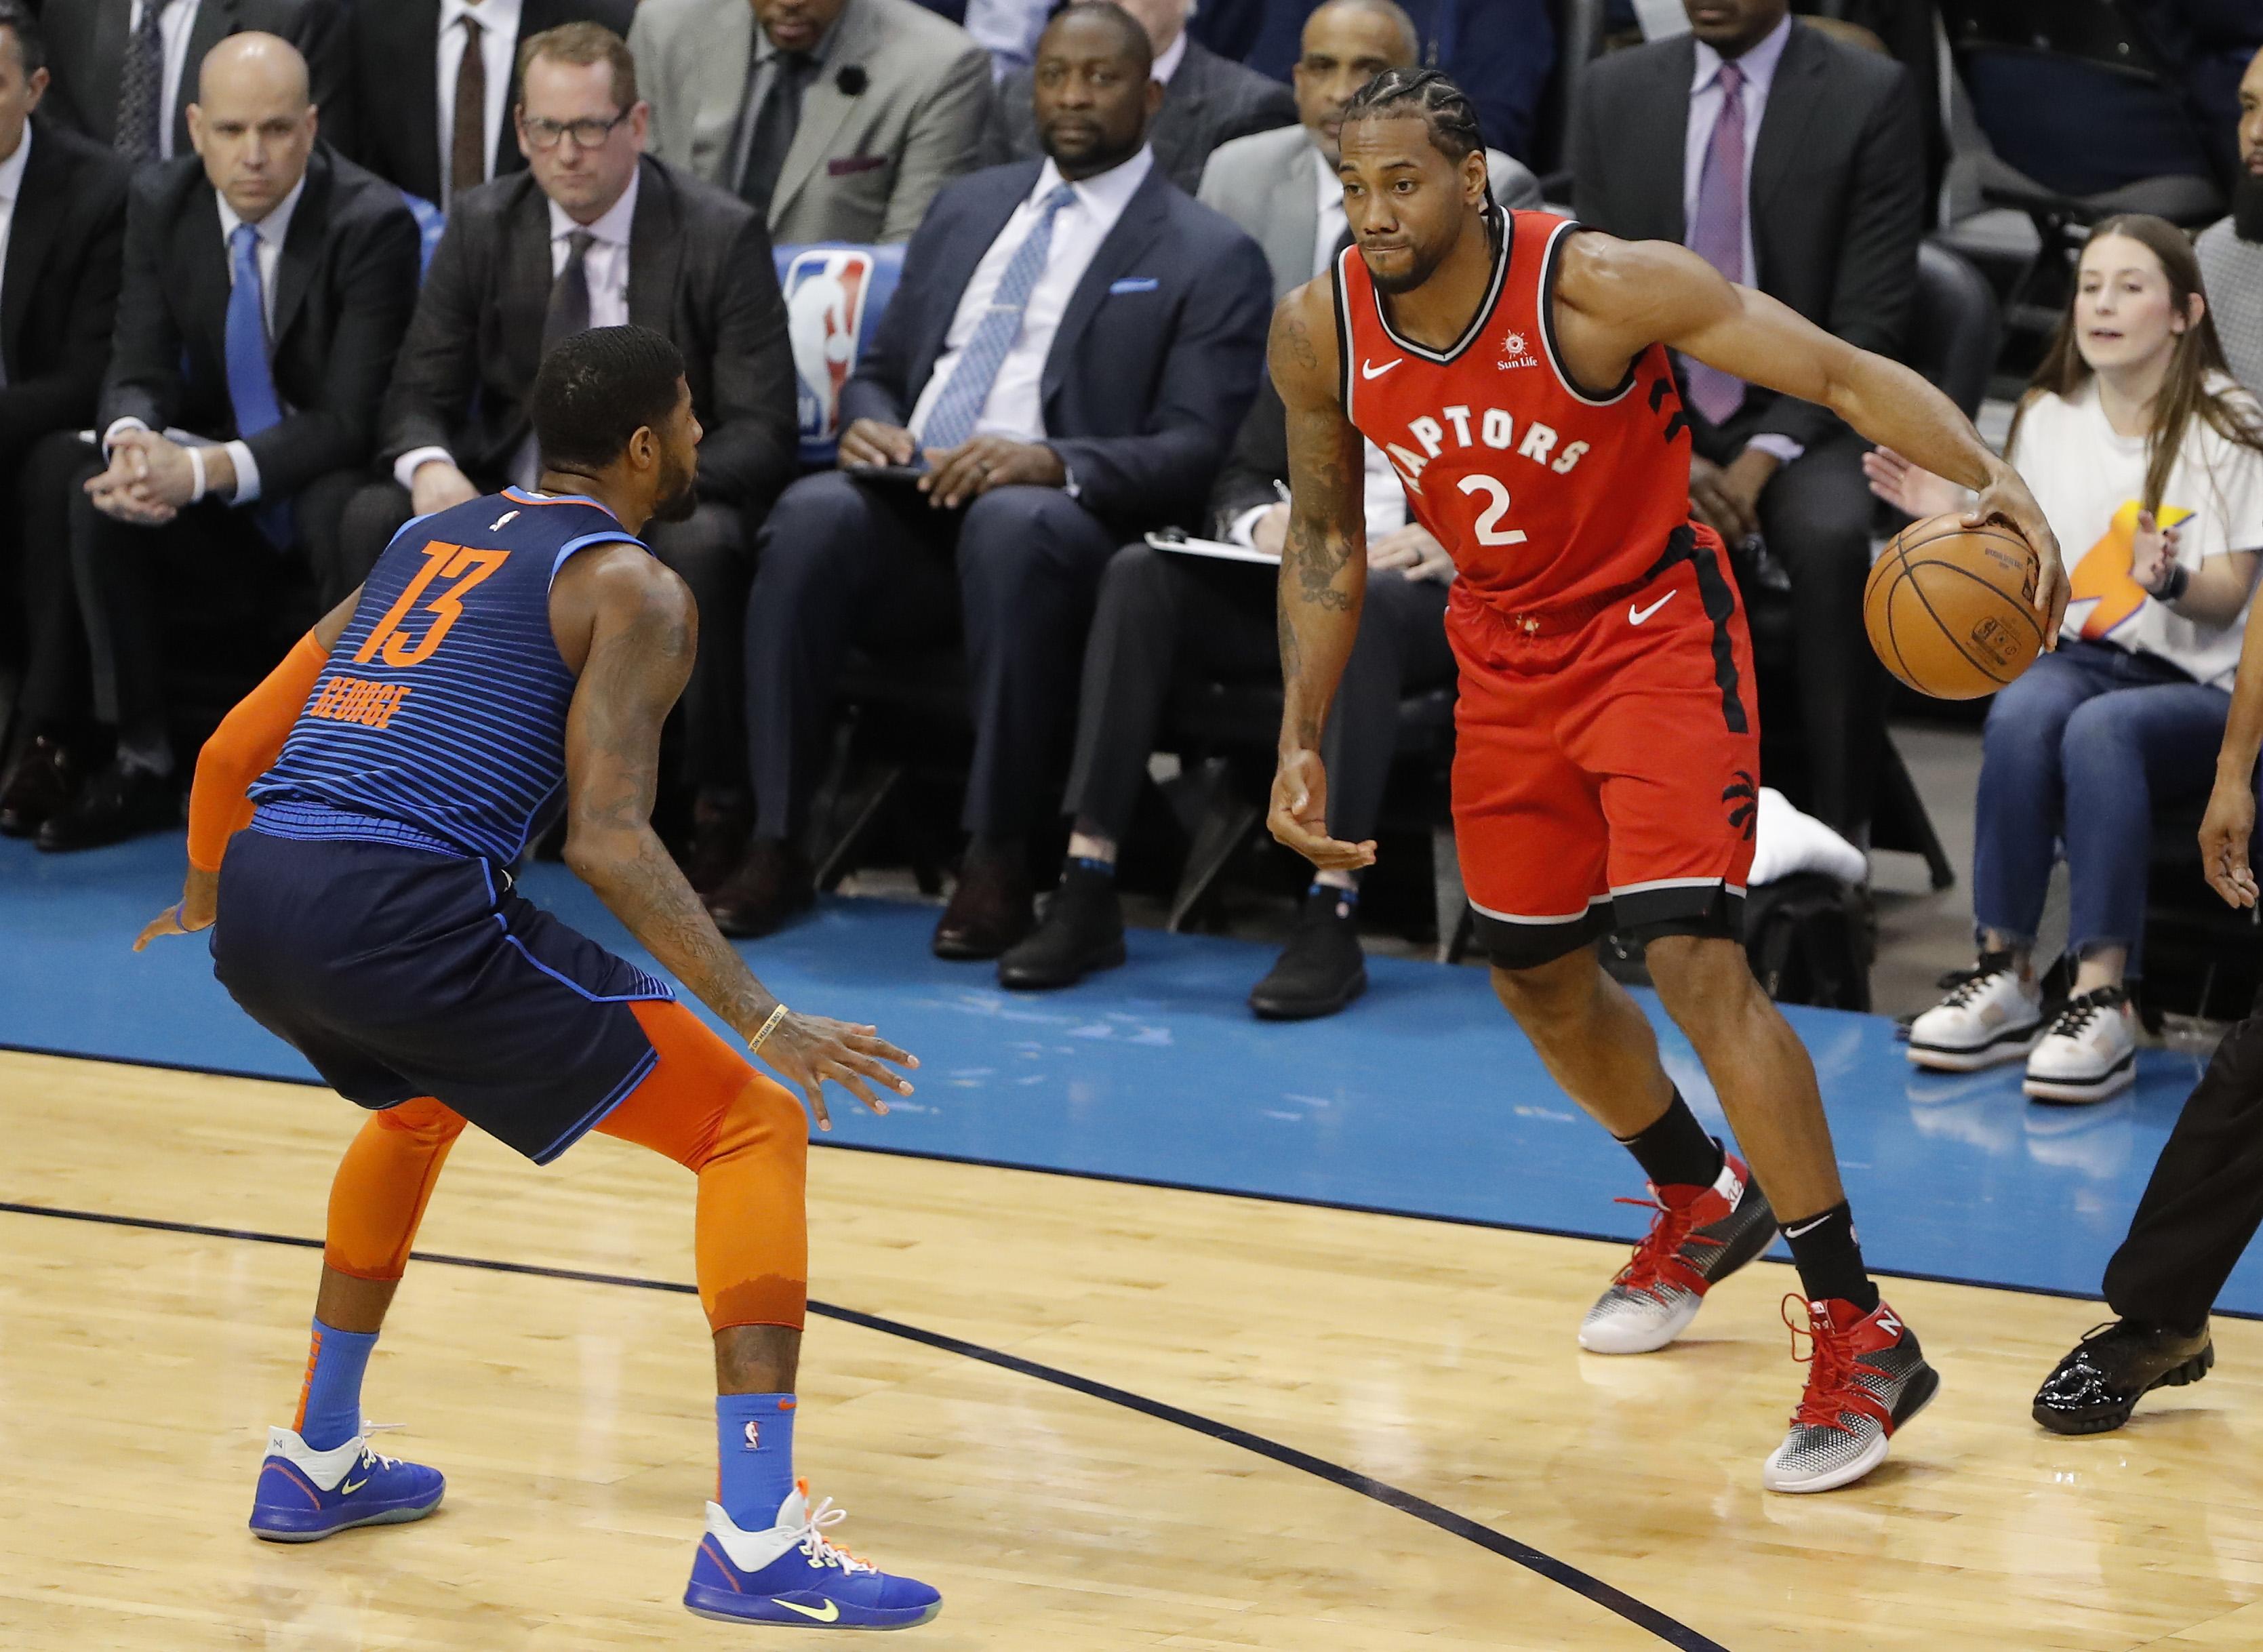 On a Wild Night, the NBA is Balanced Again